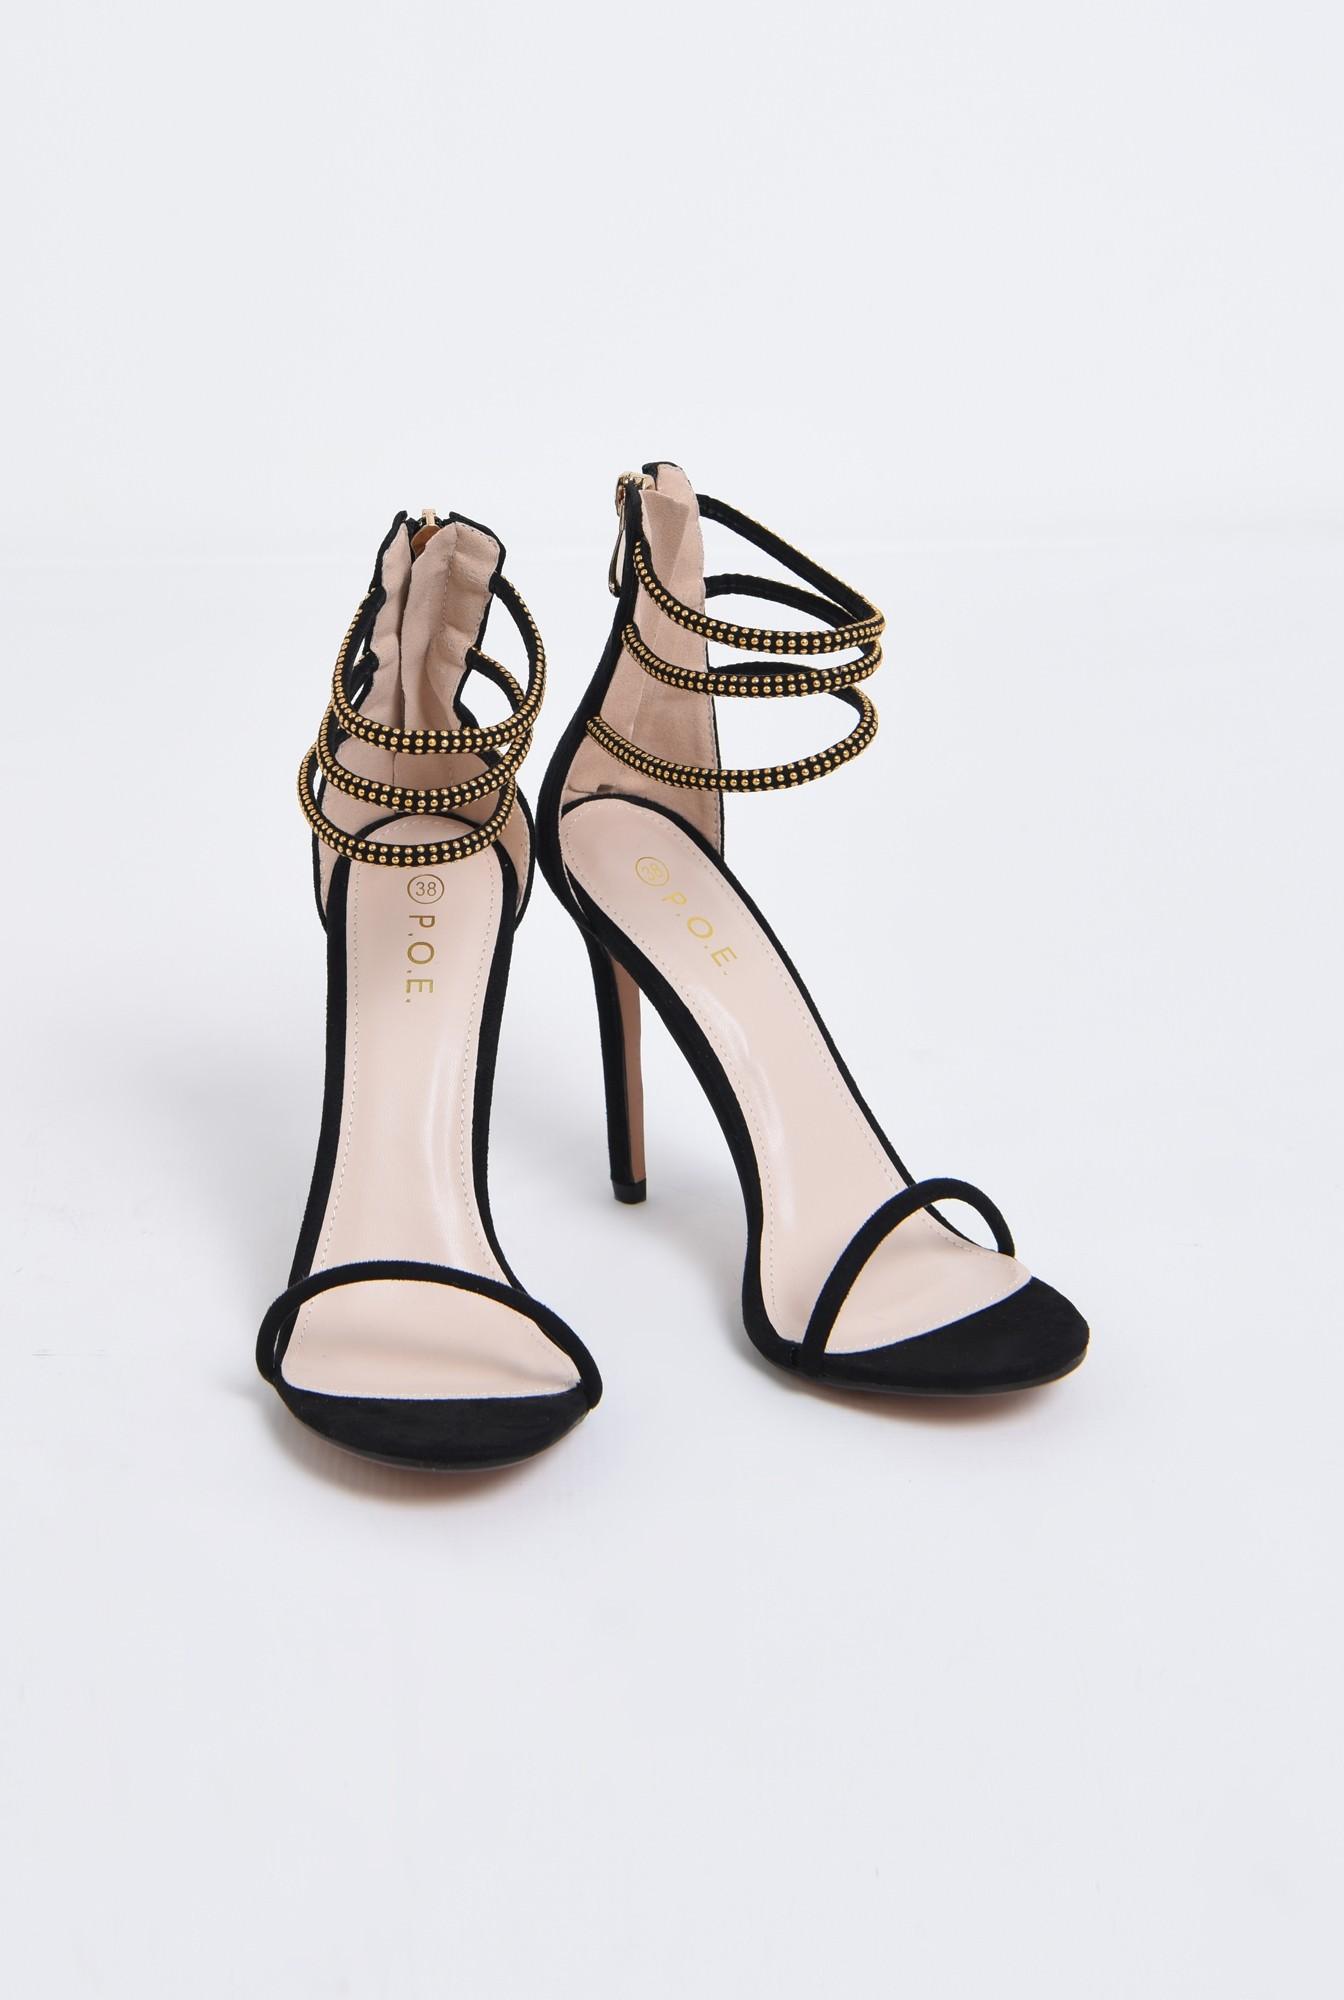 3 - sandale elegante, negre, toc inalt, barete cu aplicatii metalice